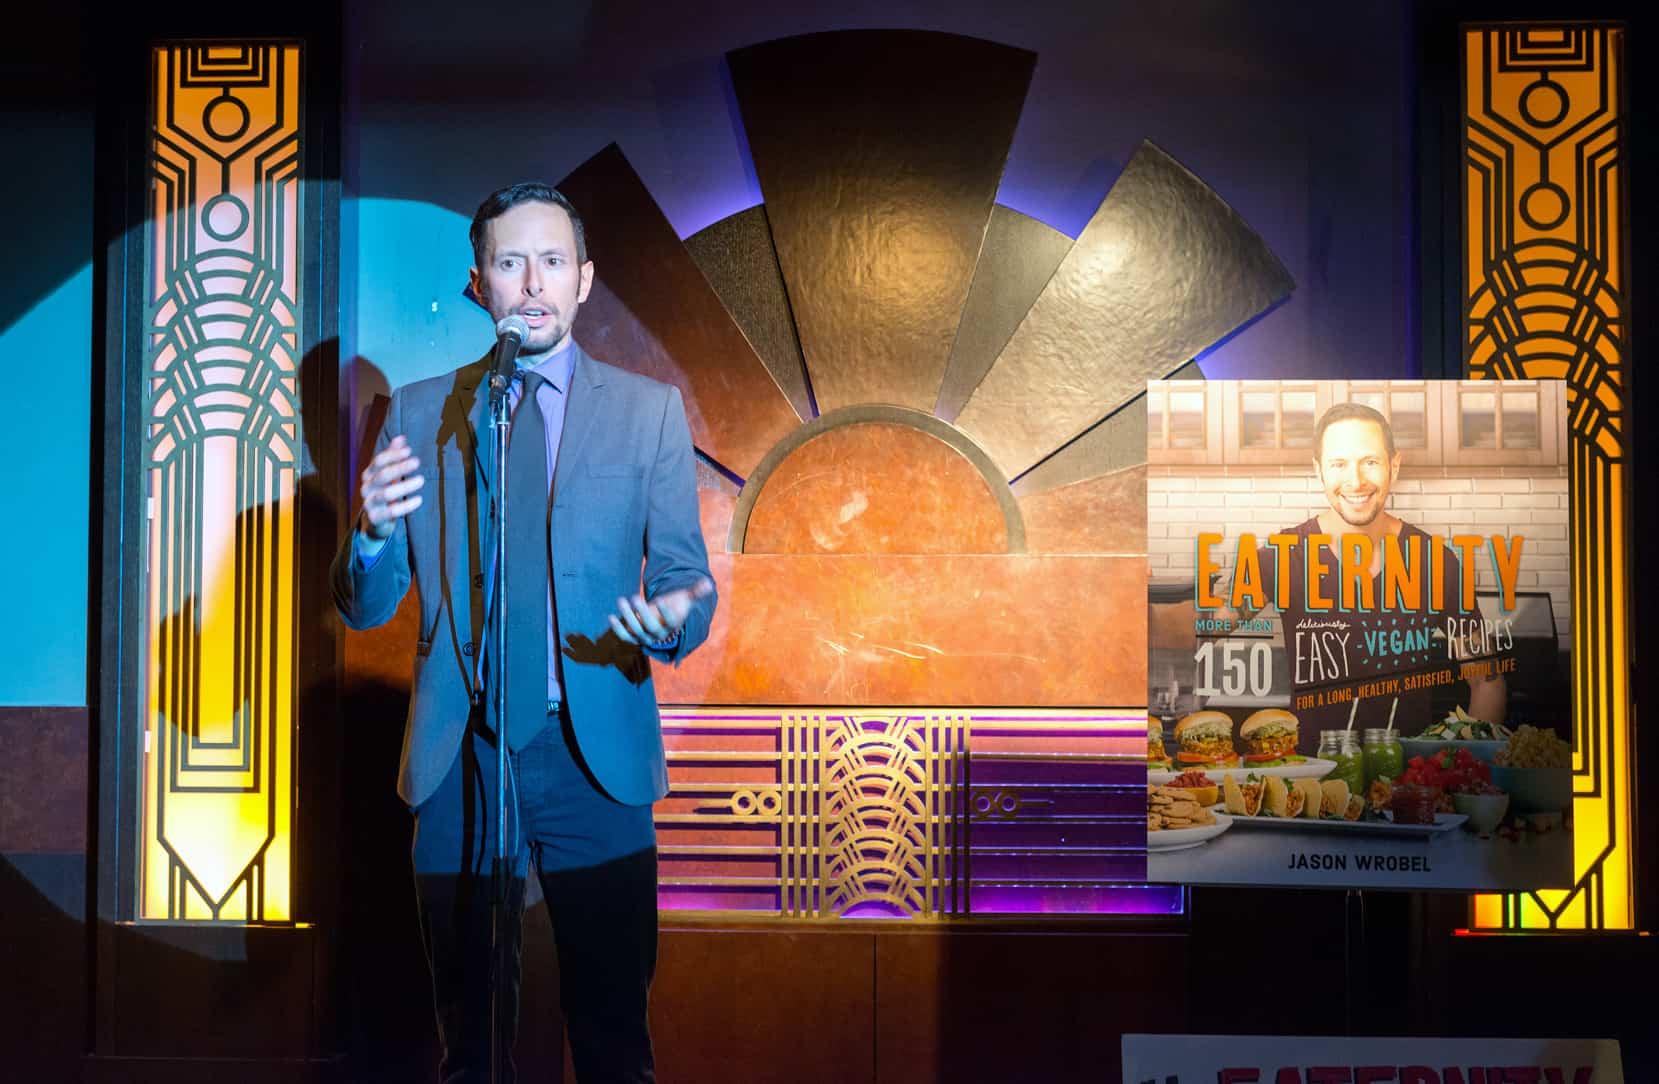 Jason Wrobel - Eaternity Cookbook Launch Party